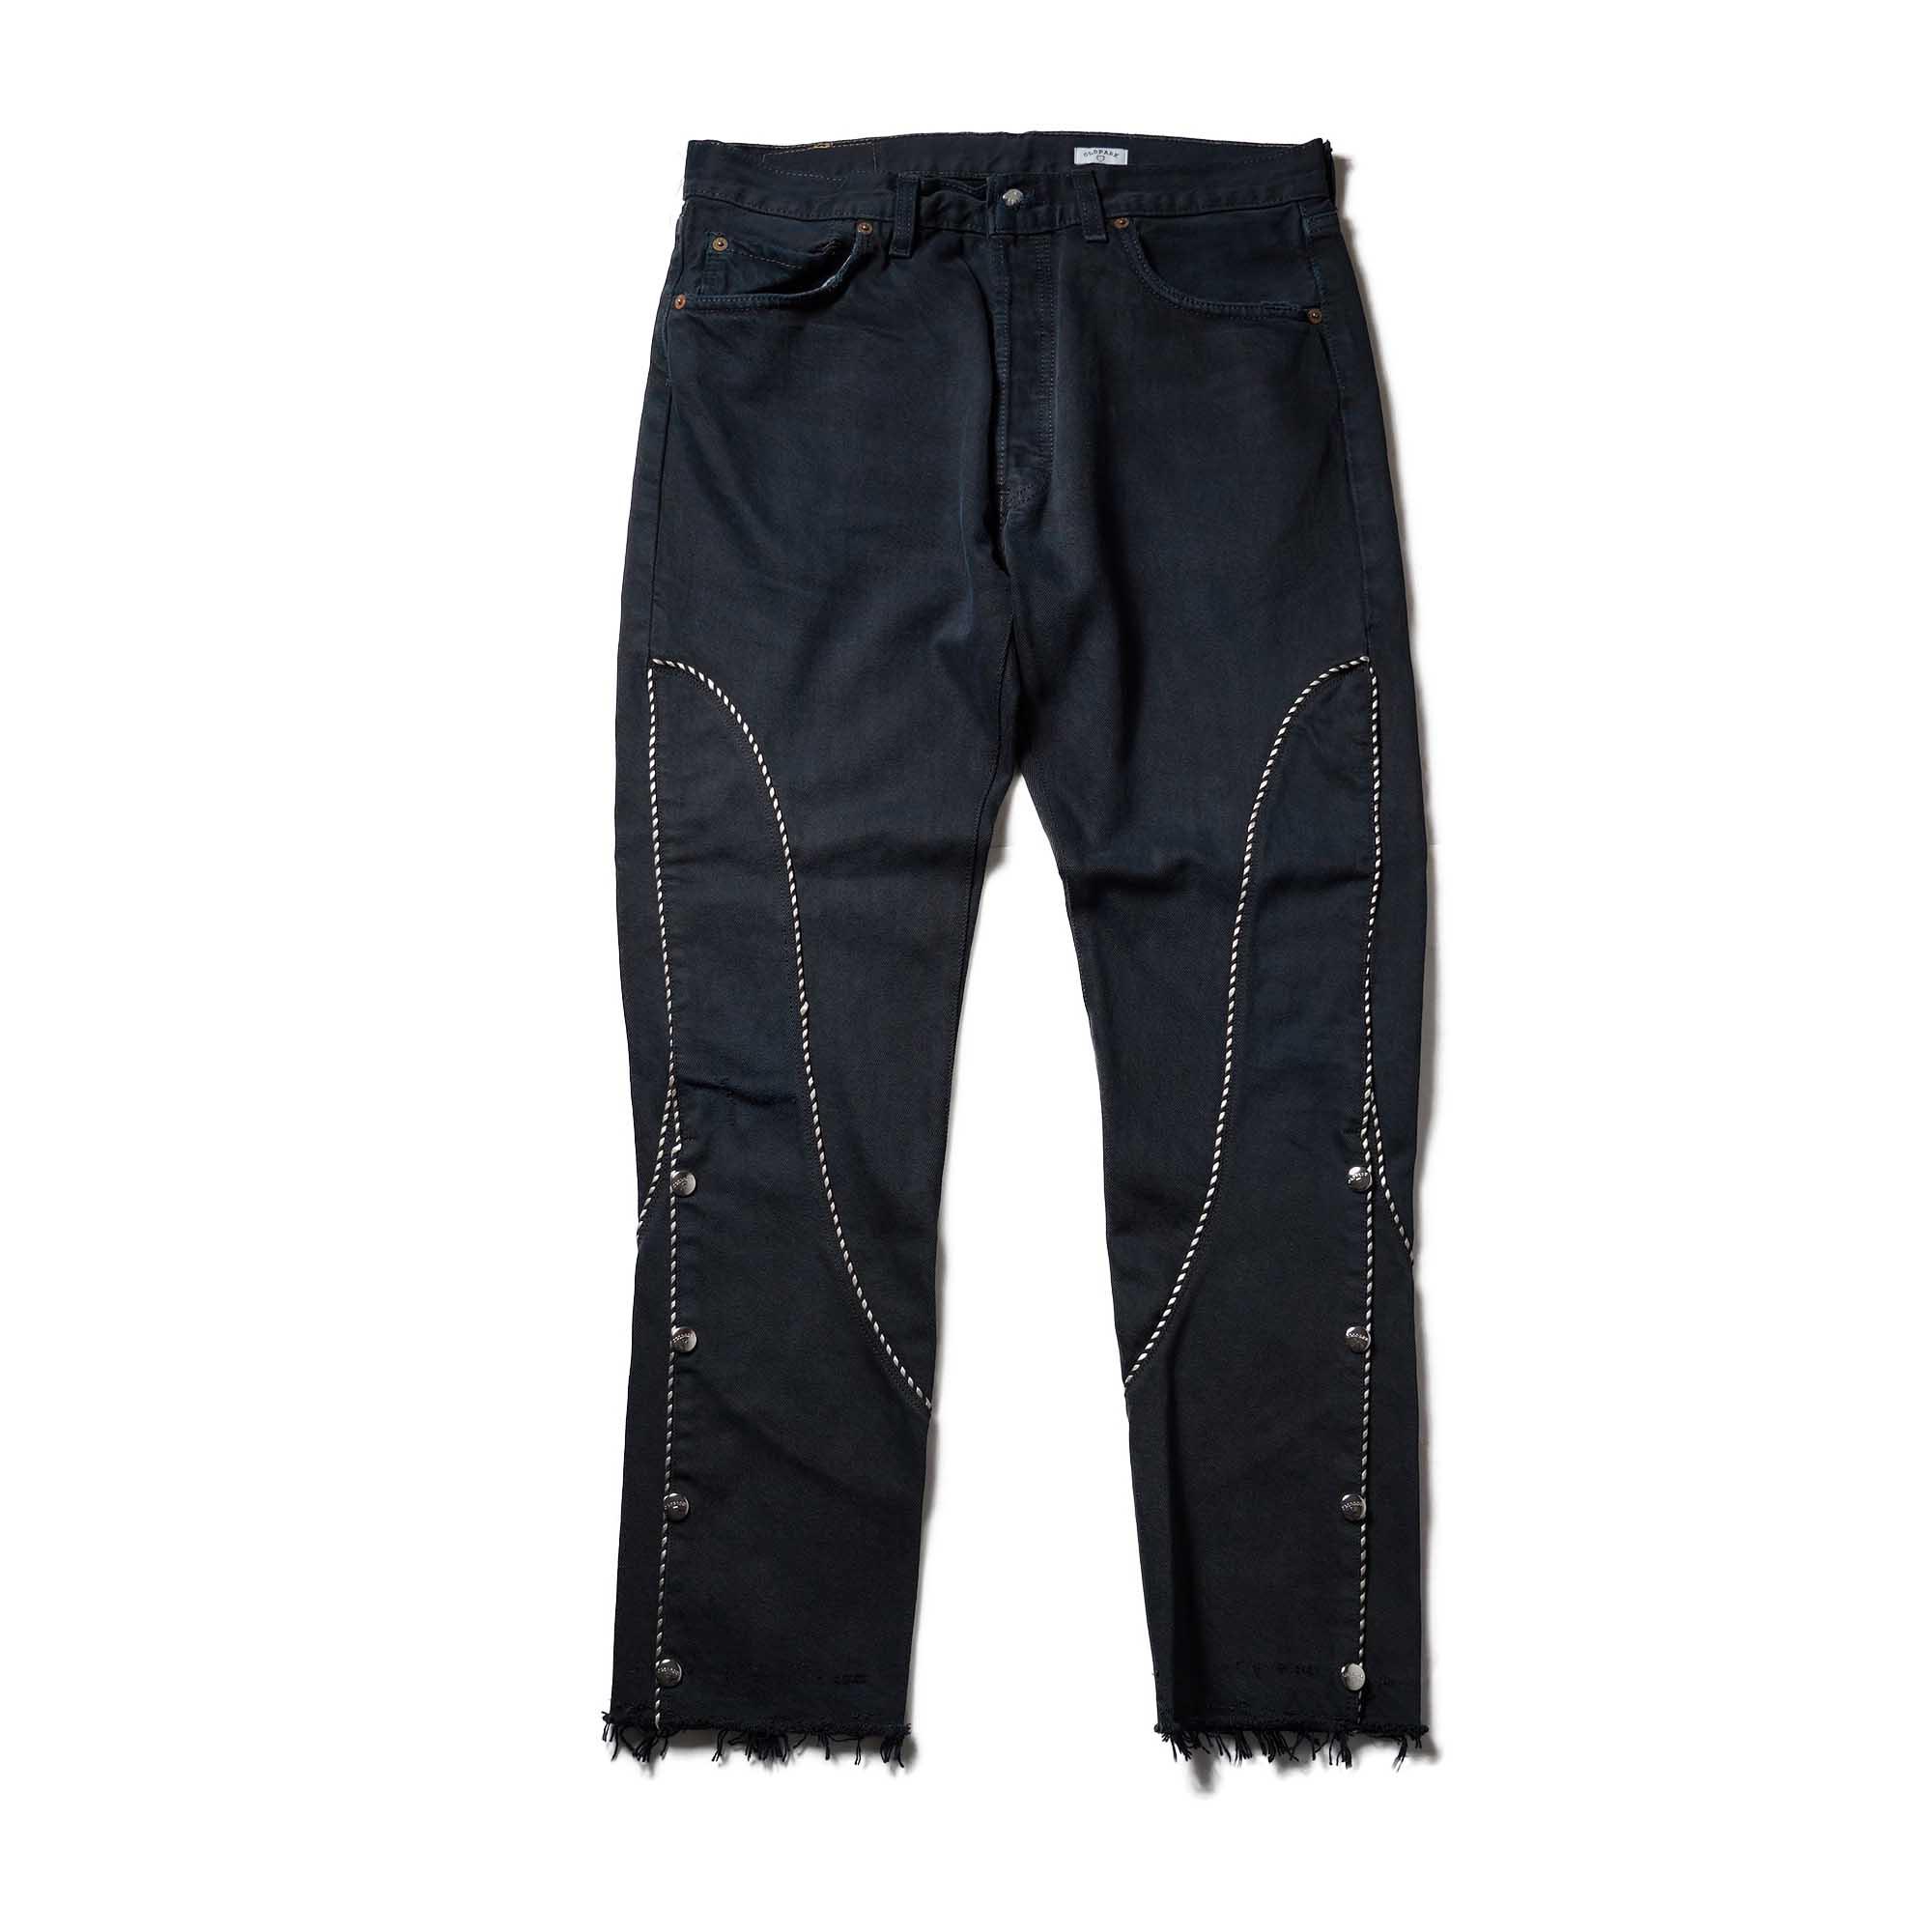 OLD PARK / Western Jeans2 Black (Lsize-A)